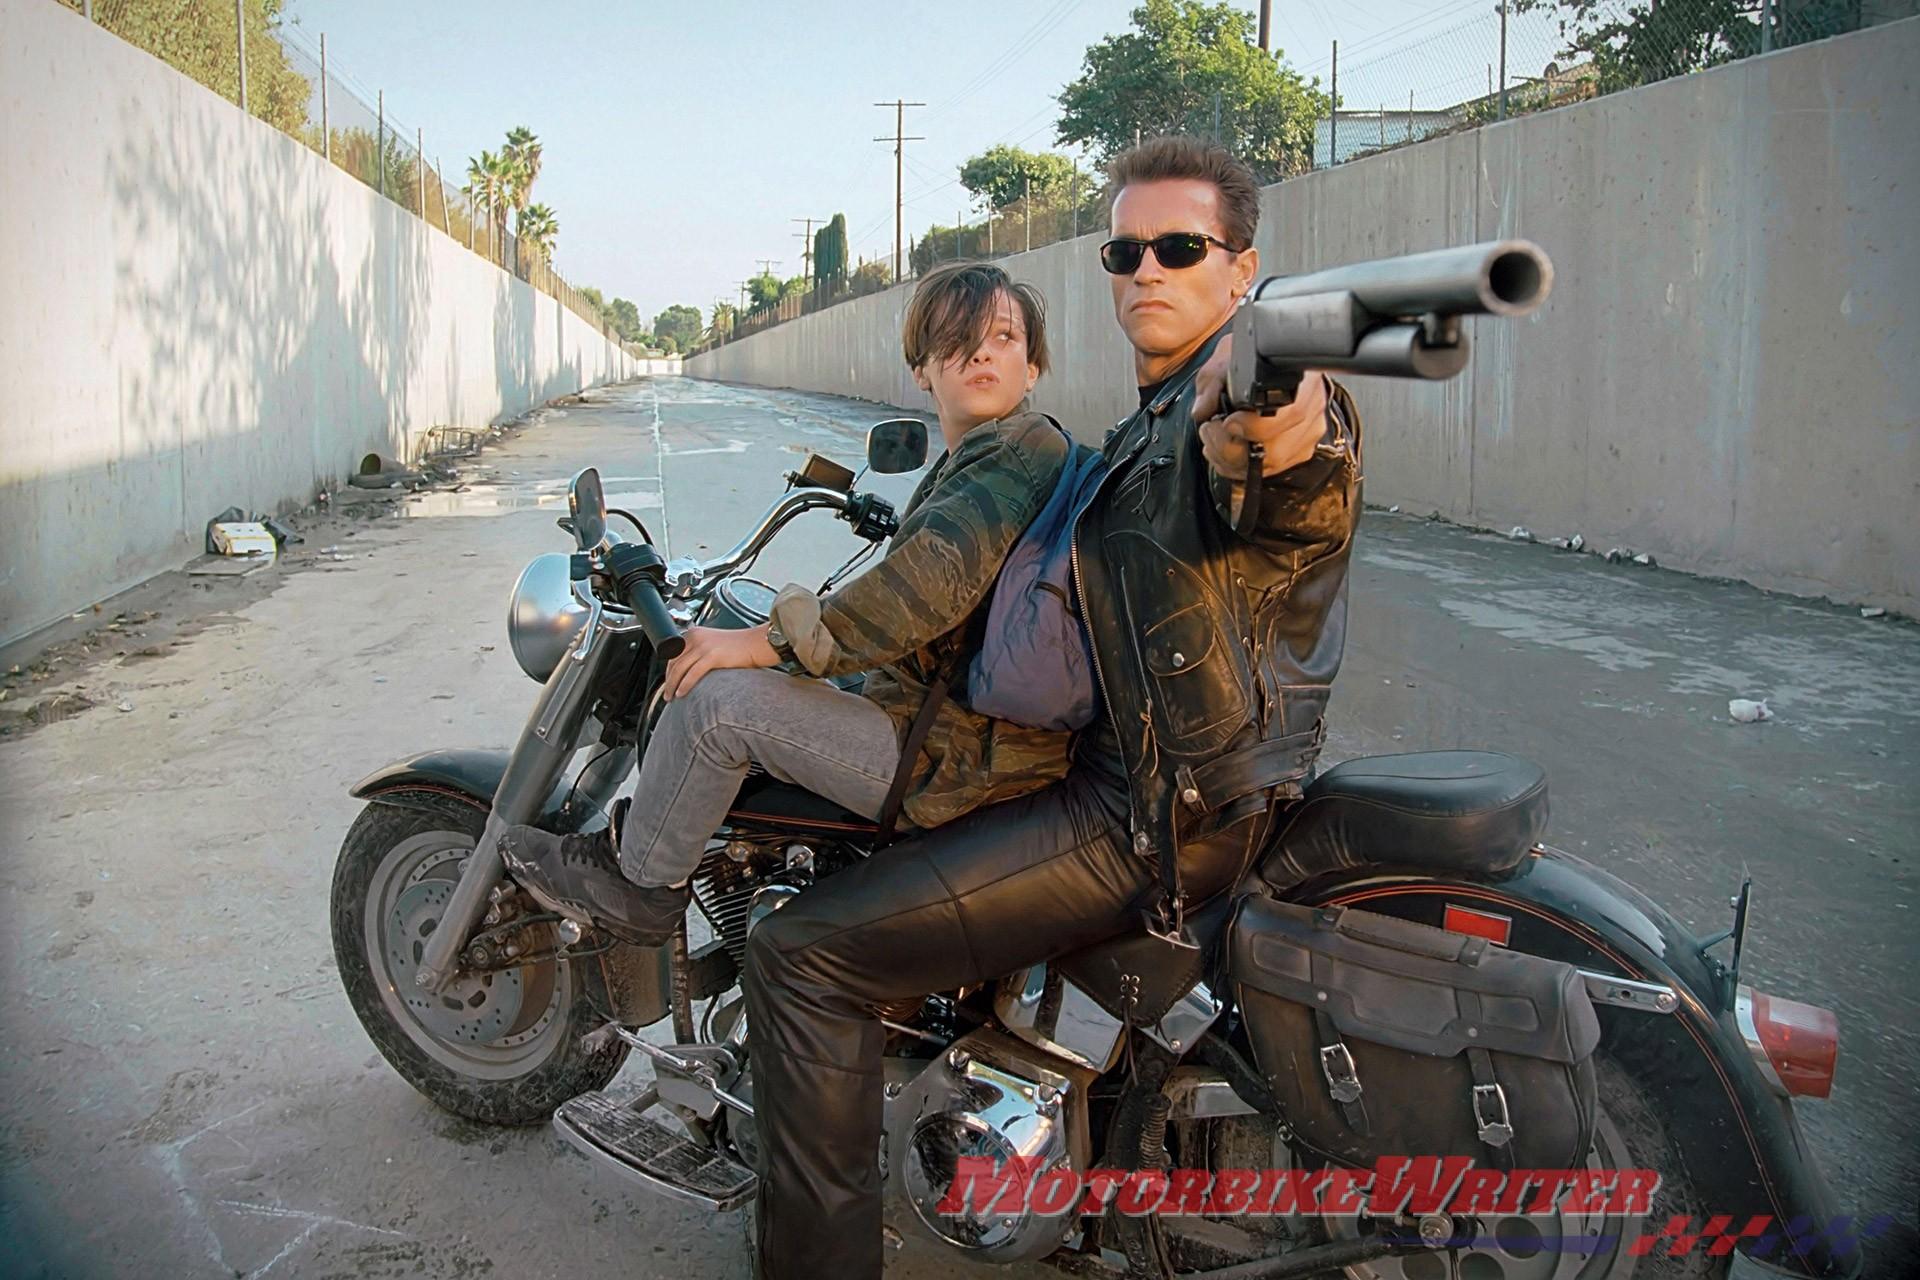 Terminator 2 Harley-davidson Fat Boy ridden by Arnold Schwarzenegger